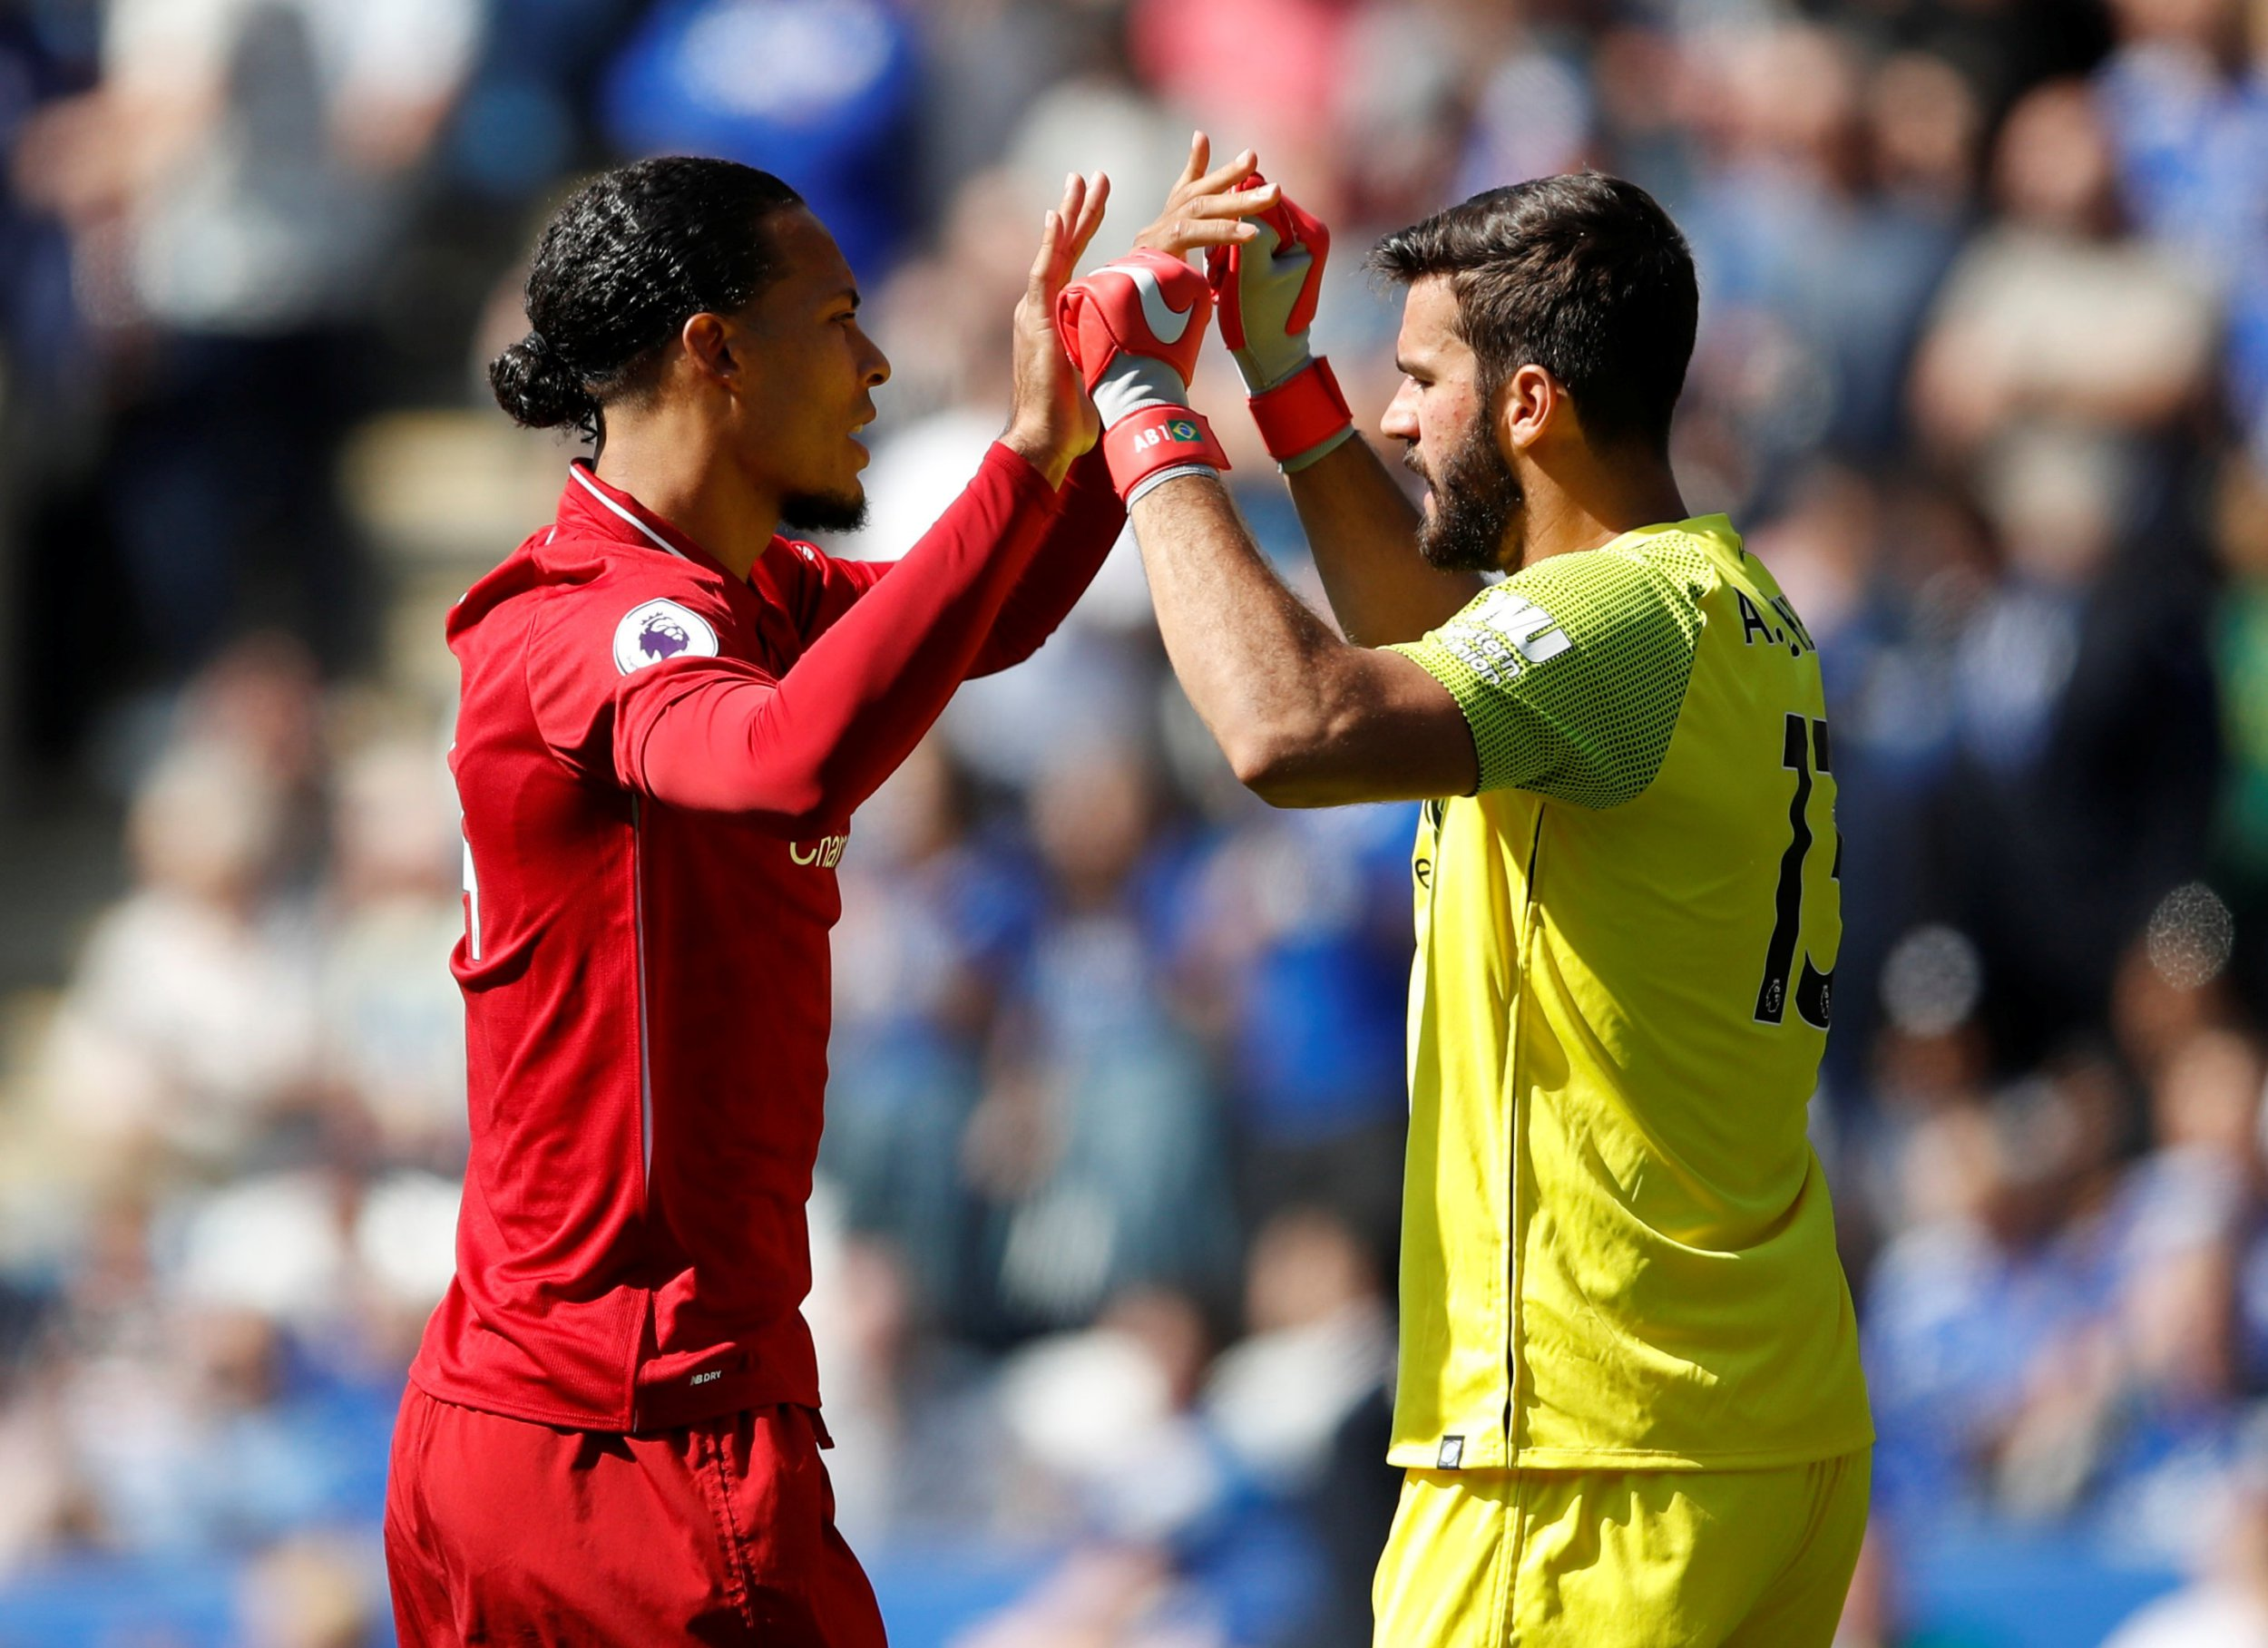 Jurgen Klopp reacts to Alisson error by warning Liverpool defenders